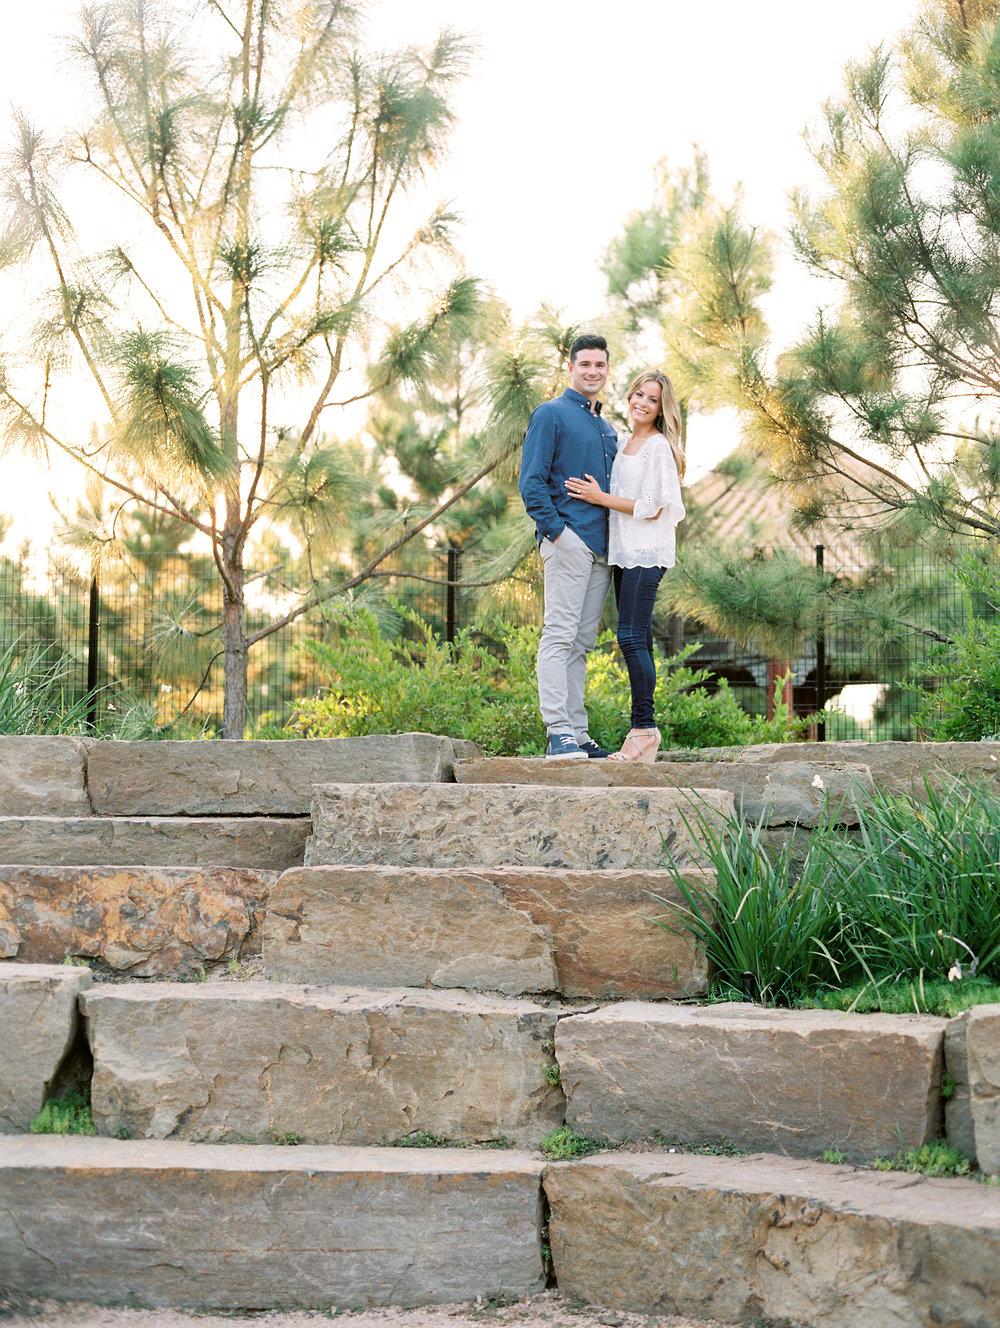 Dana-Fernandez-Photography-Houston-Engagement-Wedding-Film-Photographer-9.jpg